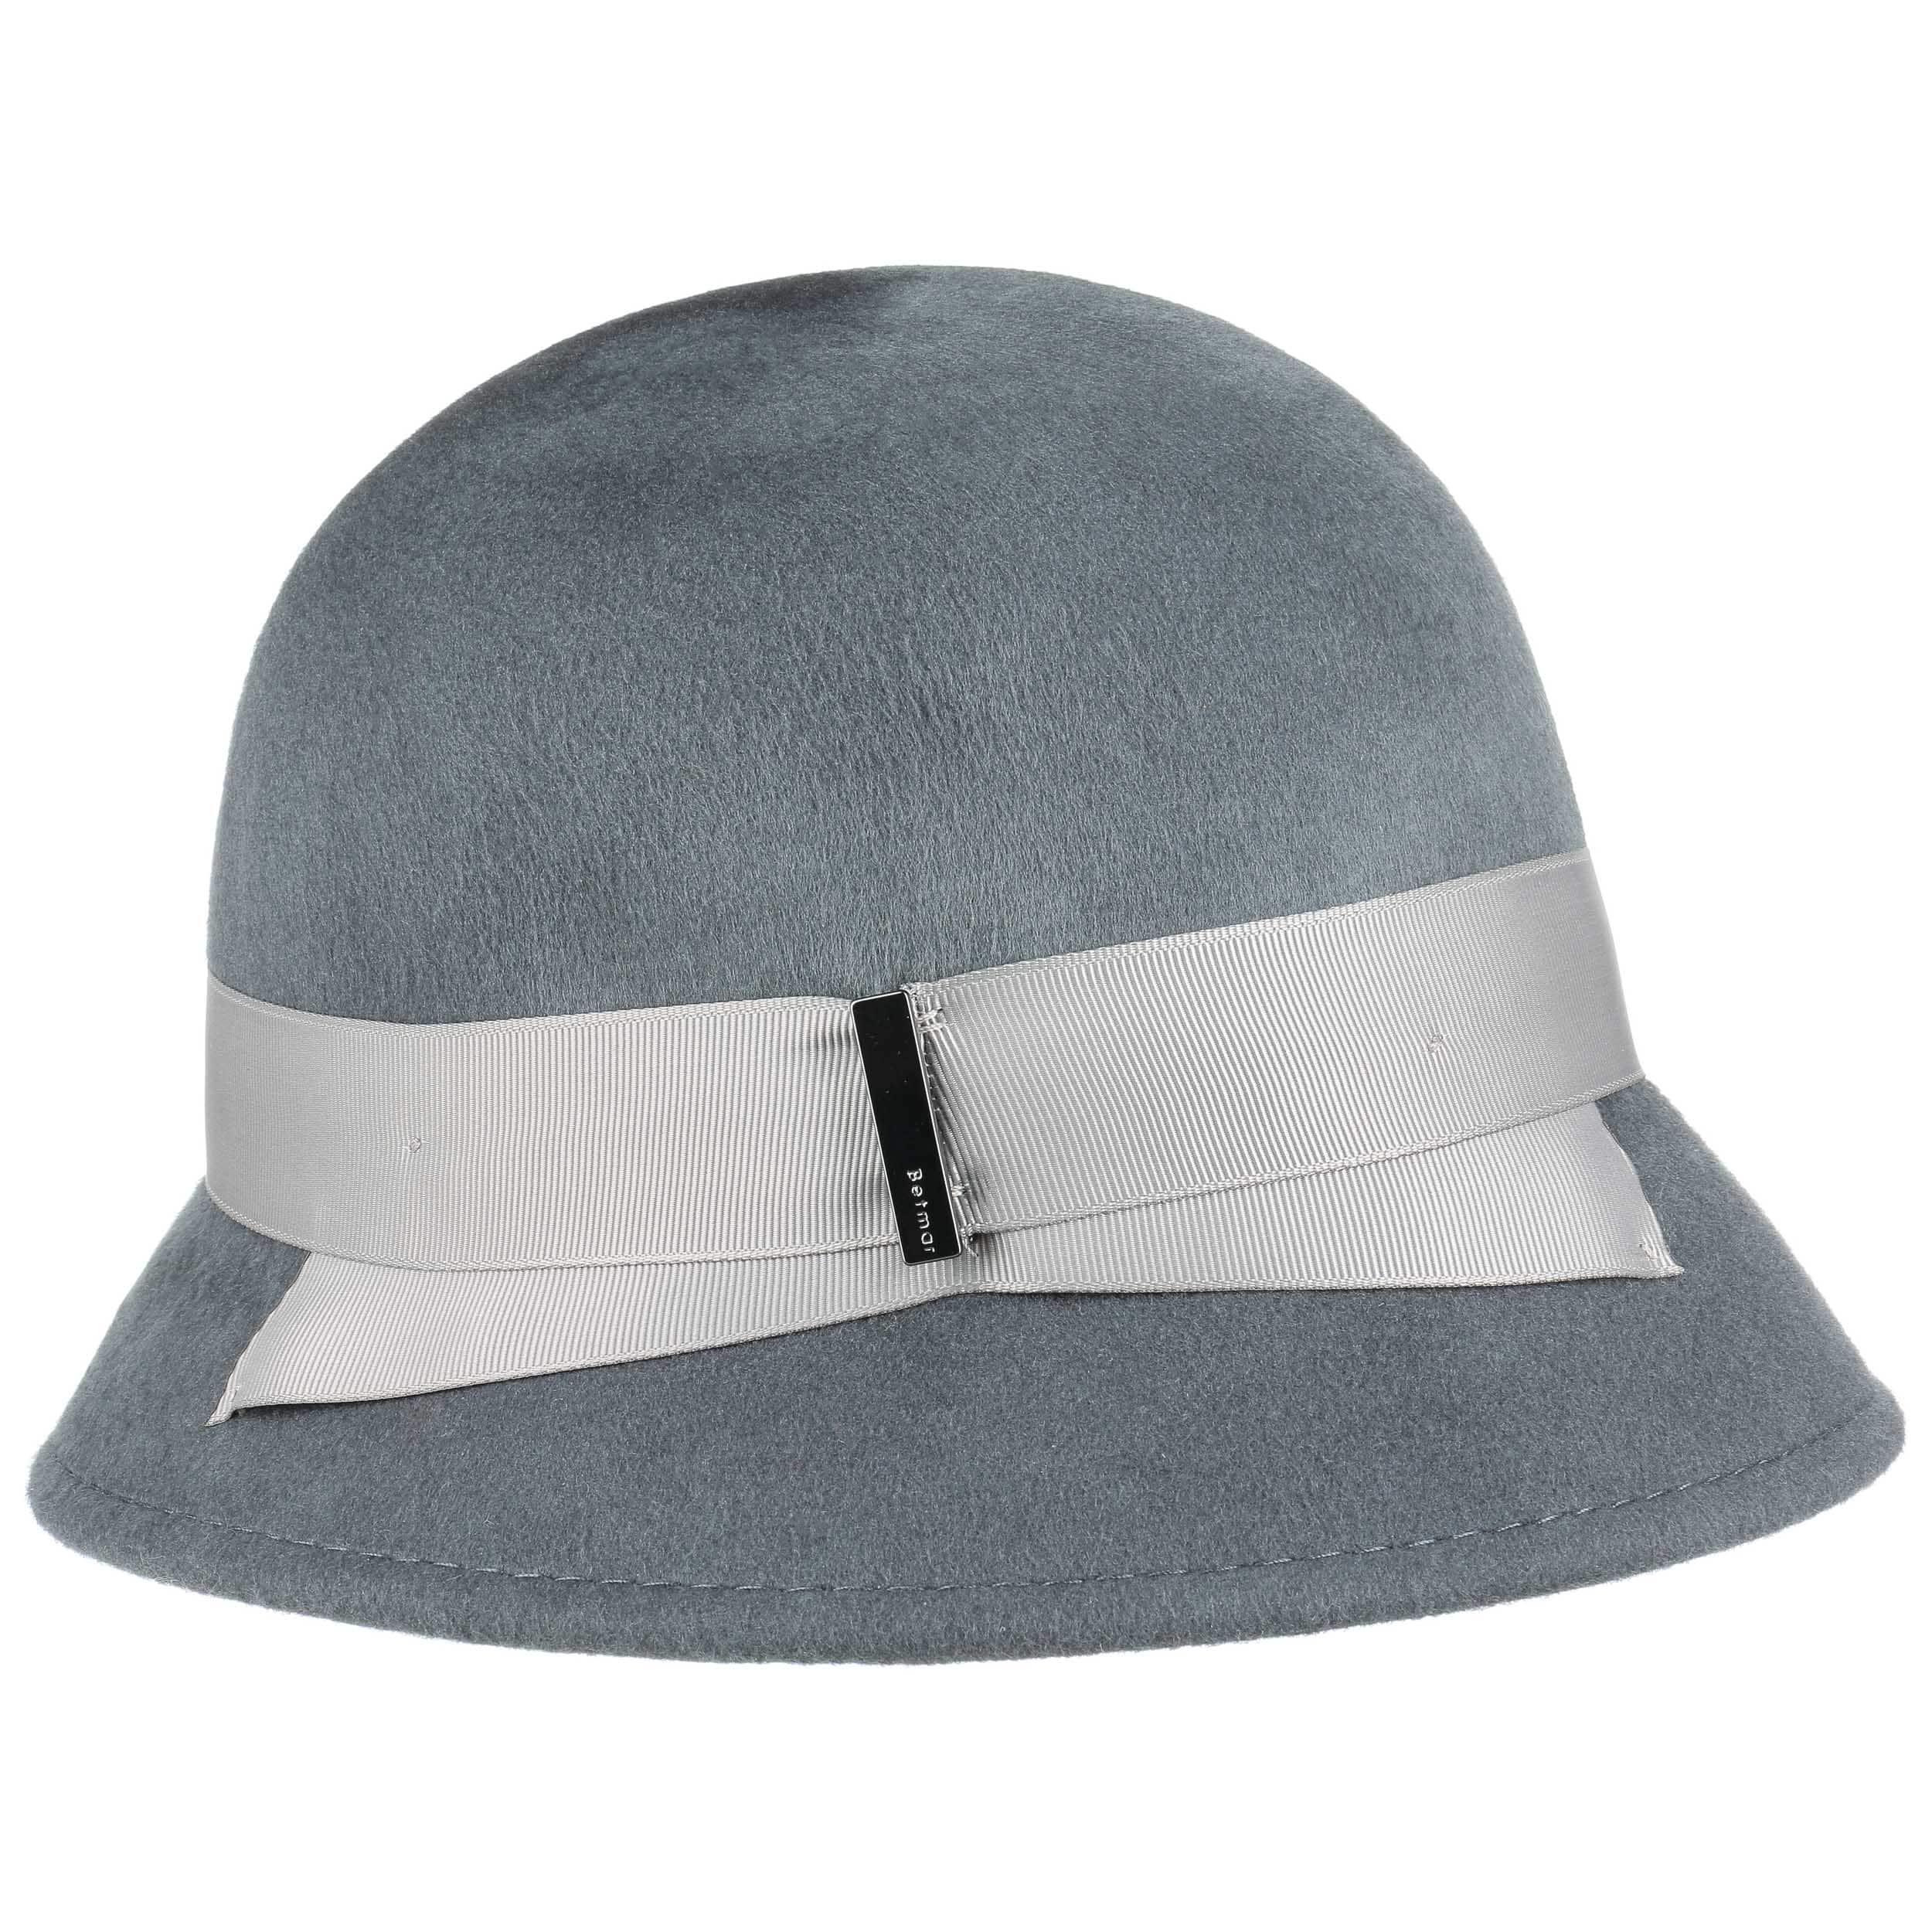 Sombrero Cloché Charleston by Betmar - Sombreros - sombreroshop.es cc1440d8a9a